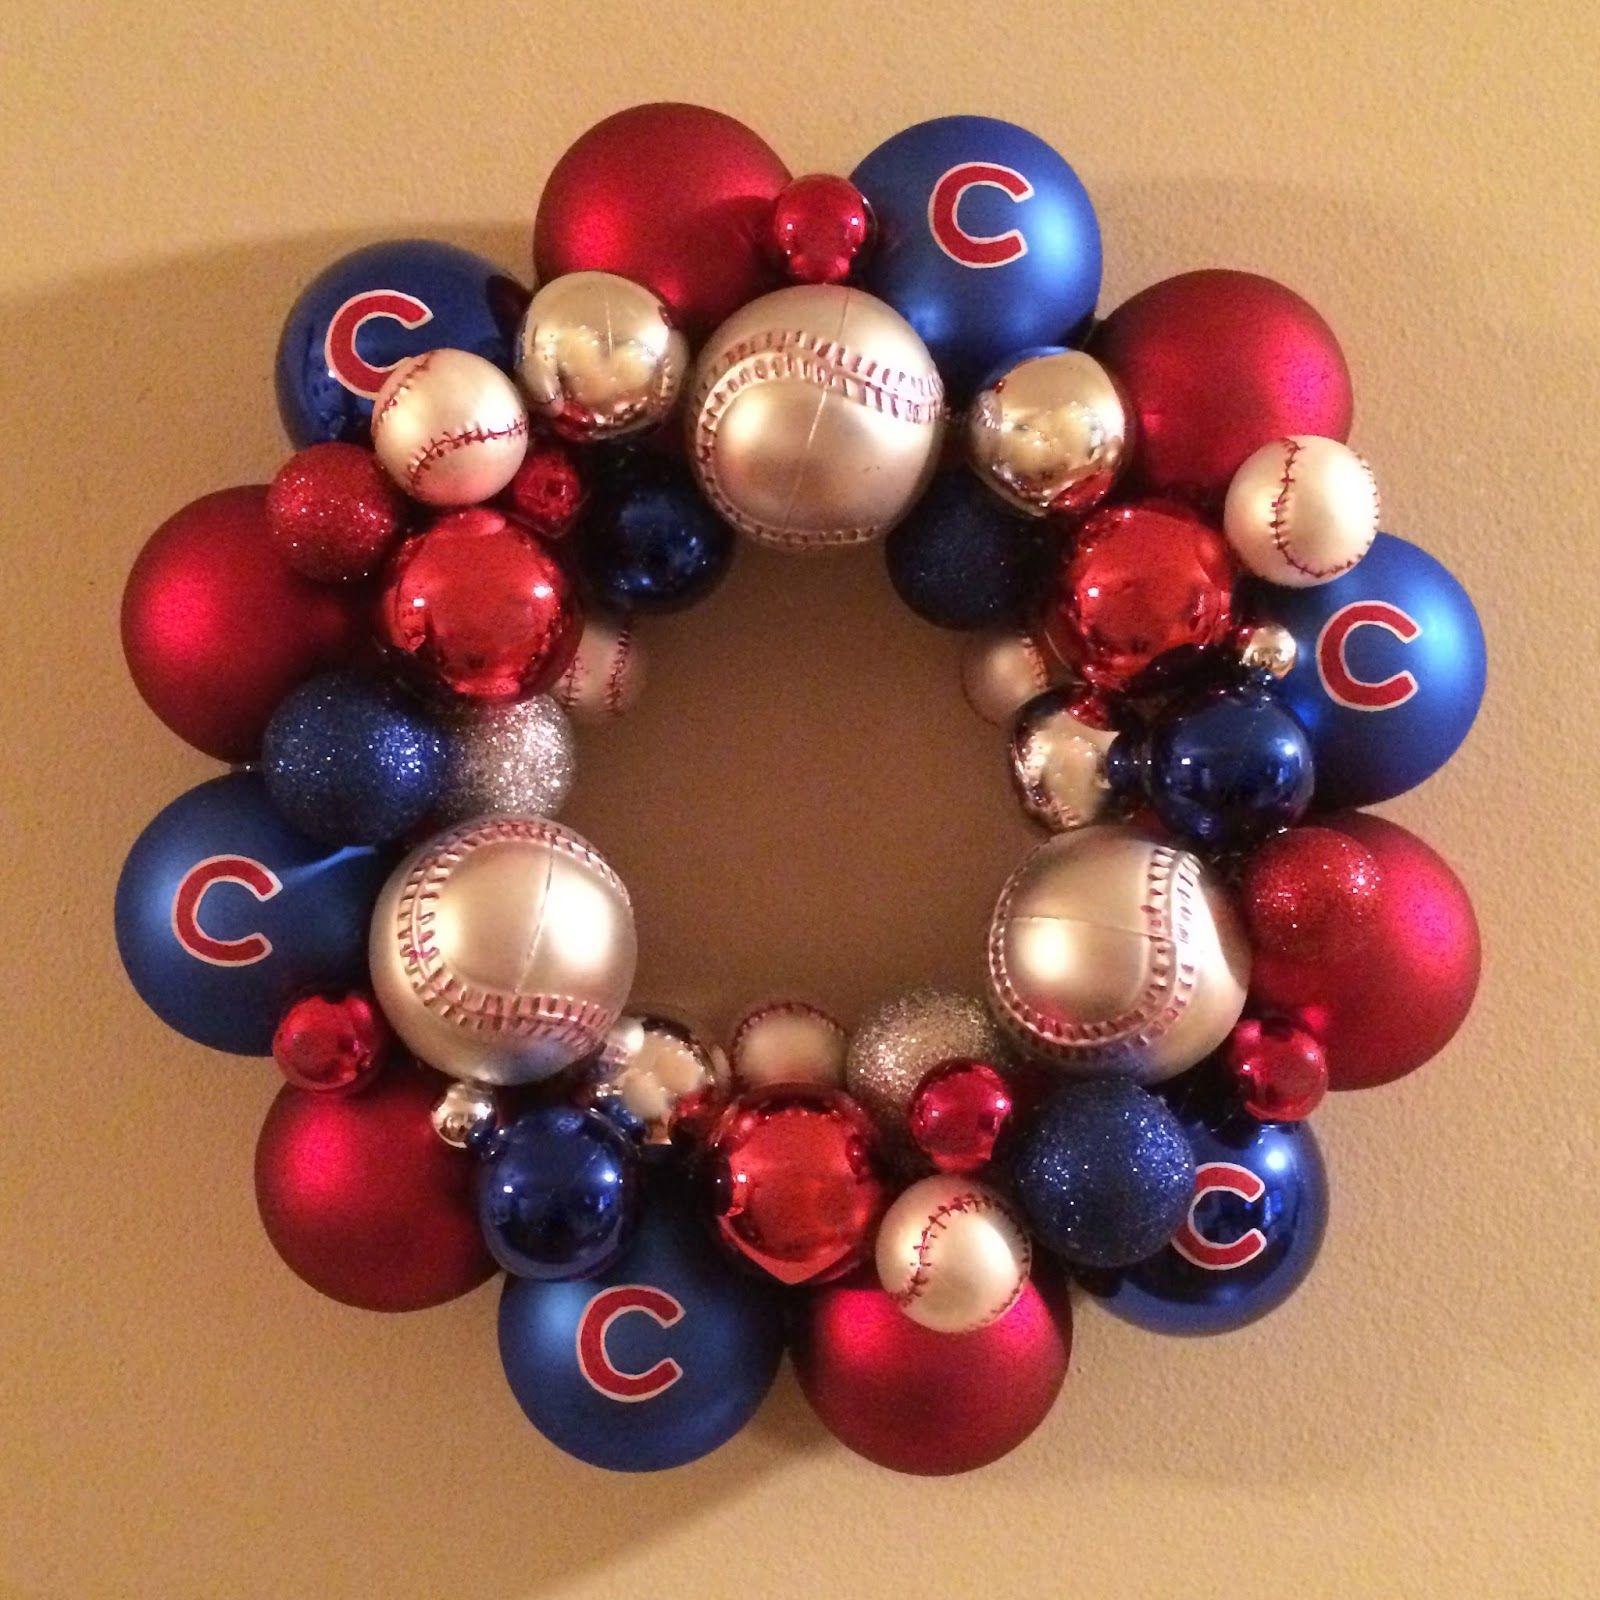 Cubs Christmas Ornaments.Diy Chicago Cubs Christmas Ornament Wreath Craftyness